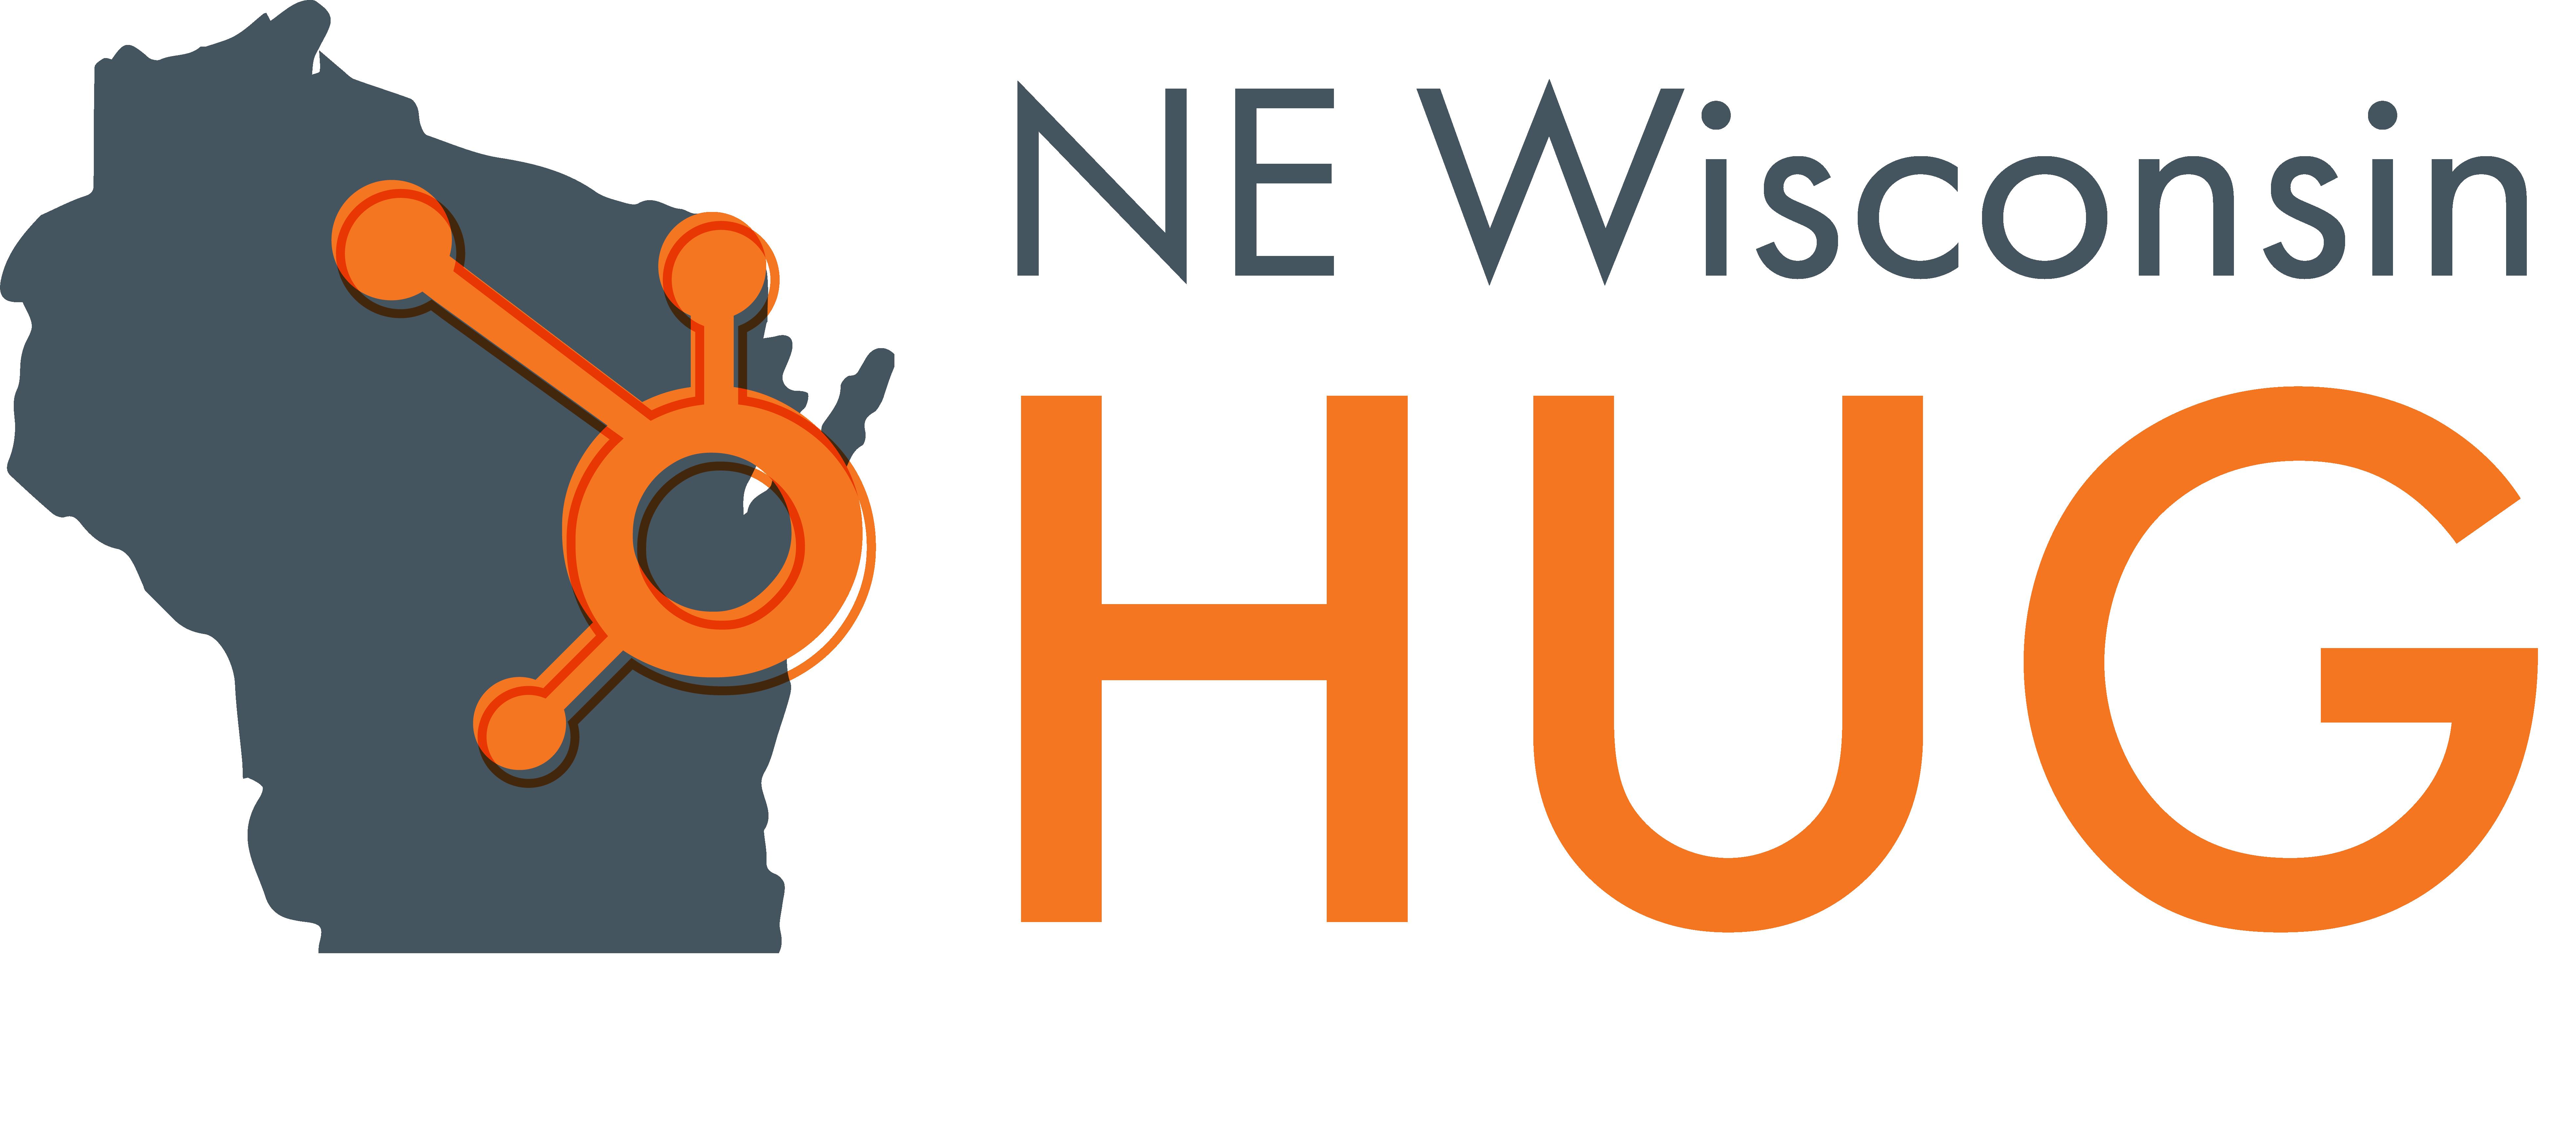 Northeast Wisconsin HubSpot User Group Logo